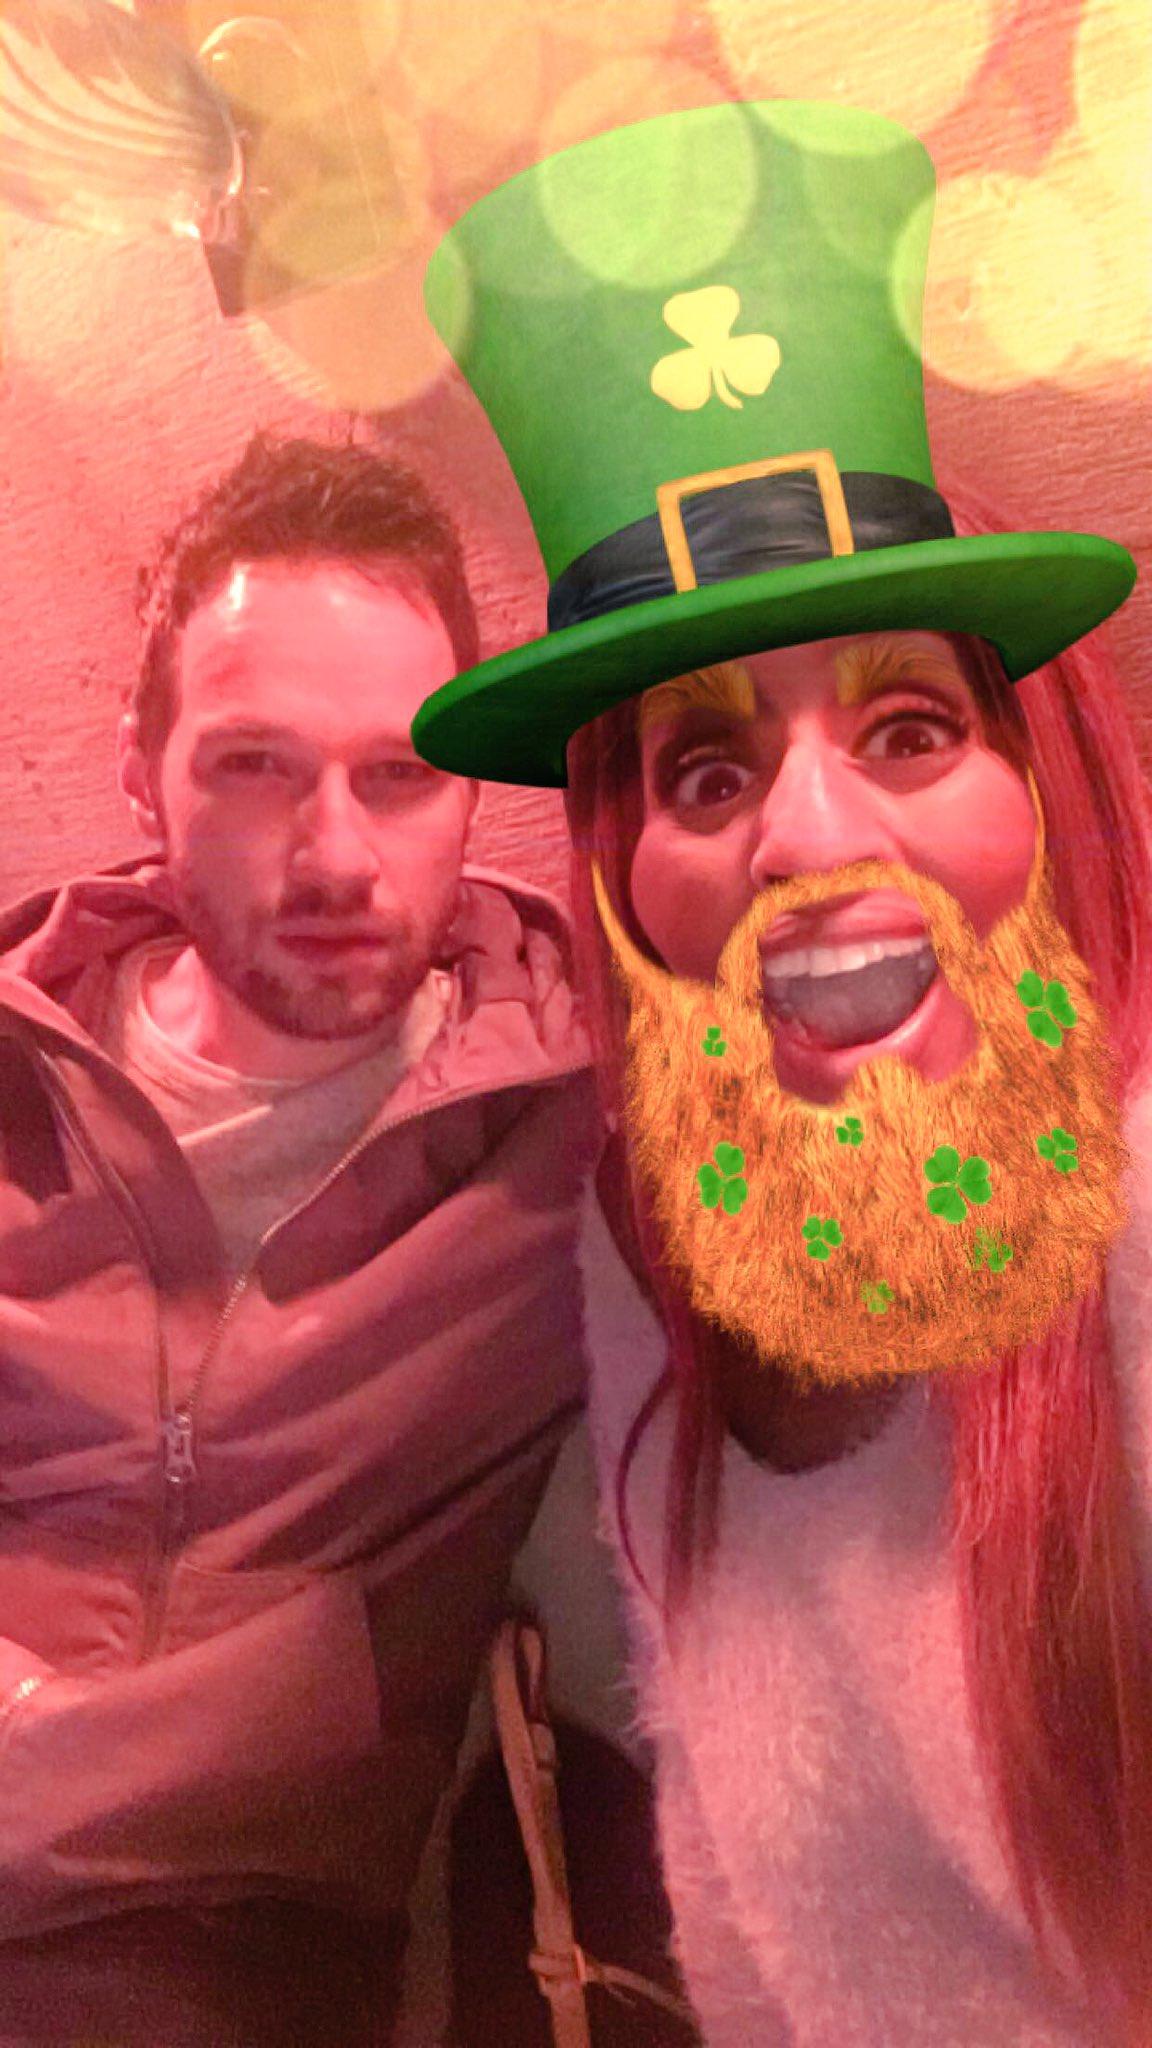 Happy St Paddy's Day!!! 🍀 🇮🇪 https://t.co/WqSFWuEueT